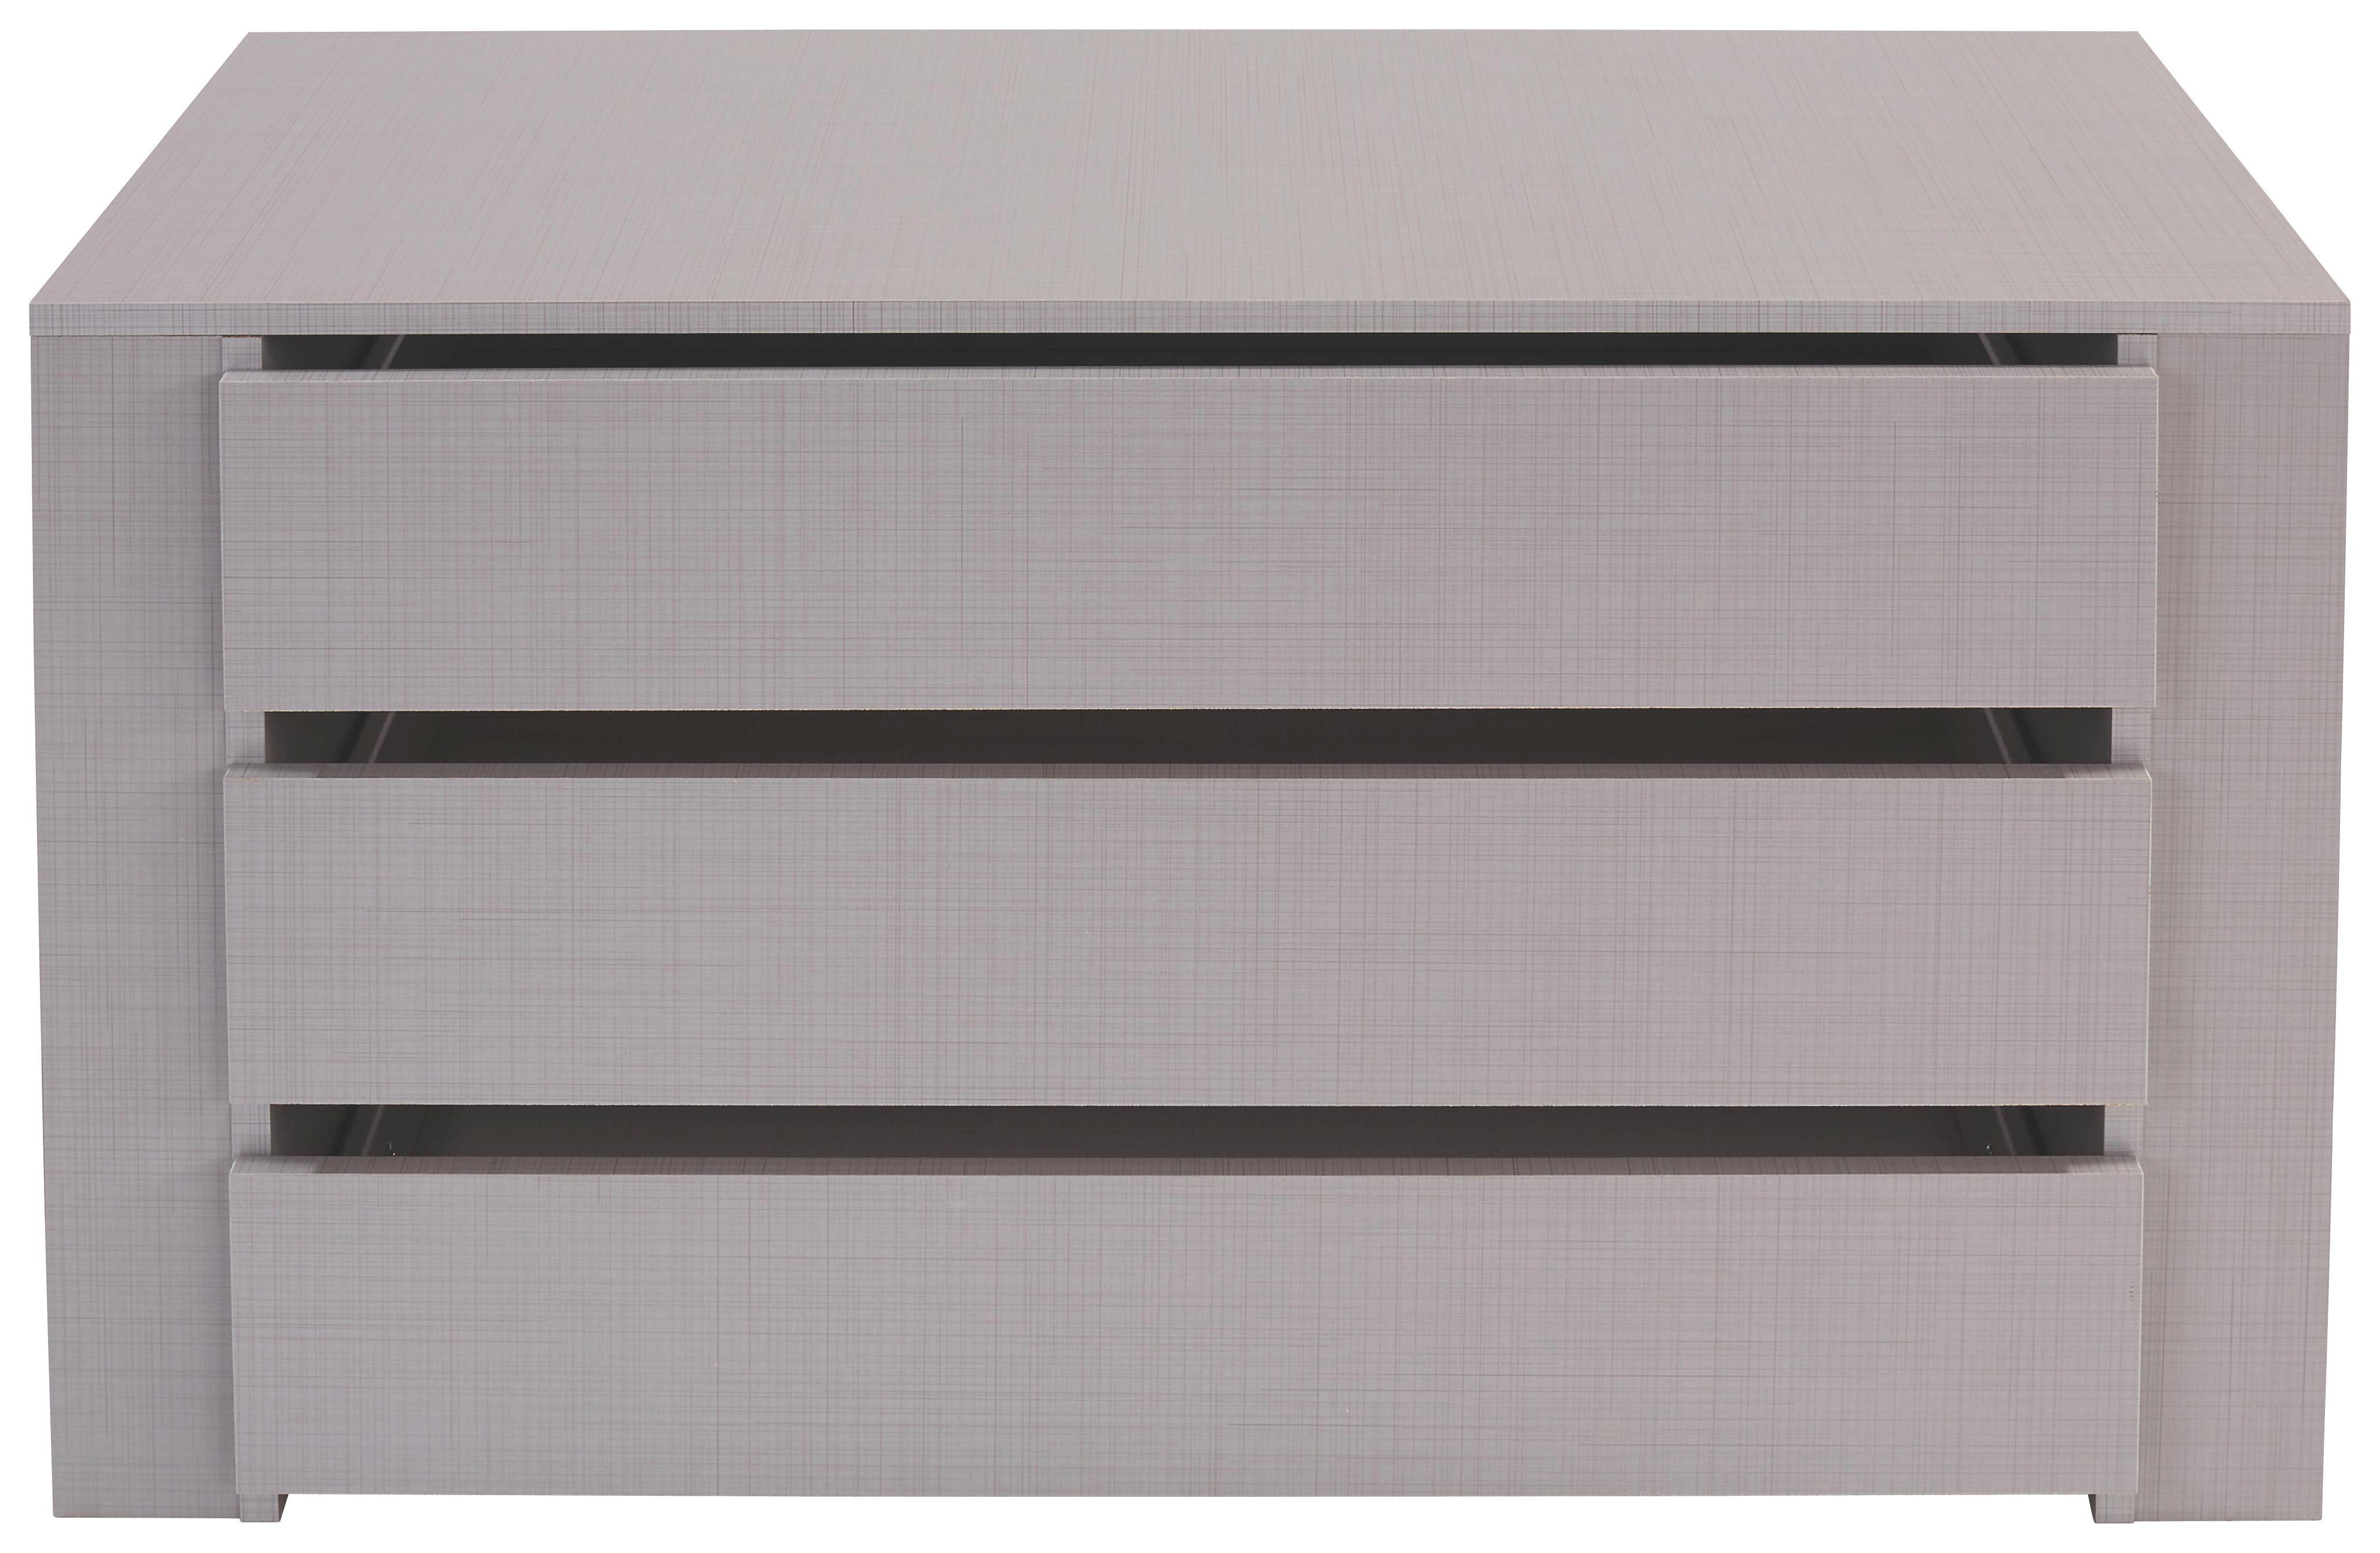 Fiókos Betét Katrin/new York/ilona - szürke, modern, fa/faanyagok (87/54/42cm)